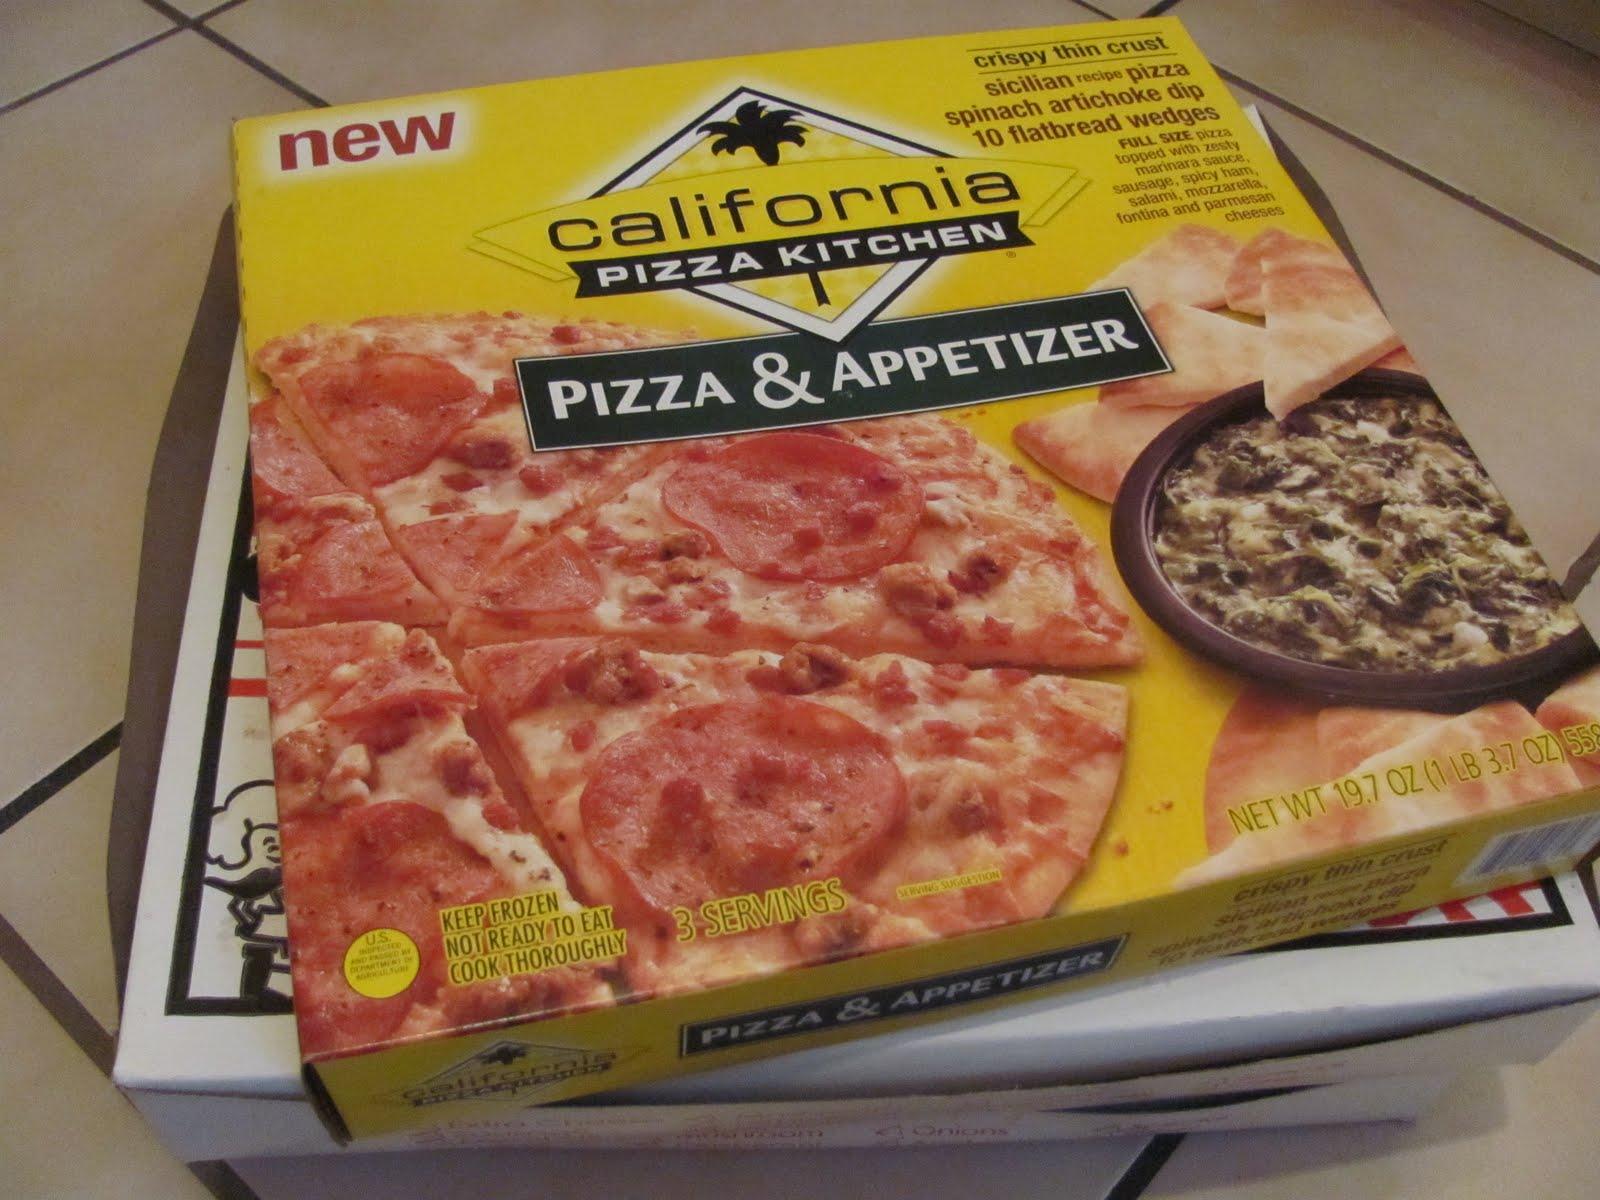 California Pizza Kitchen Frozen Pizza California Pizza Kitchen Pizza And Appetizer Sicilian Pizza And